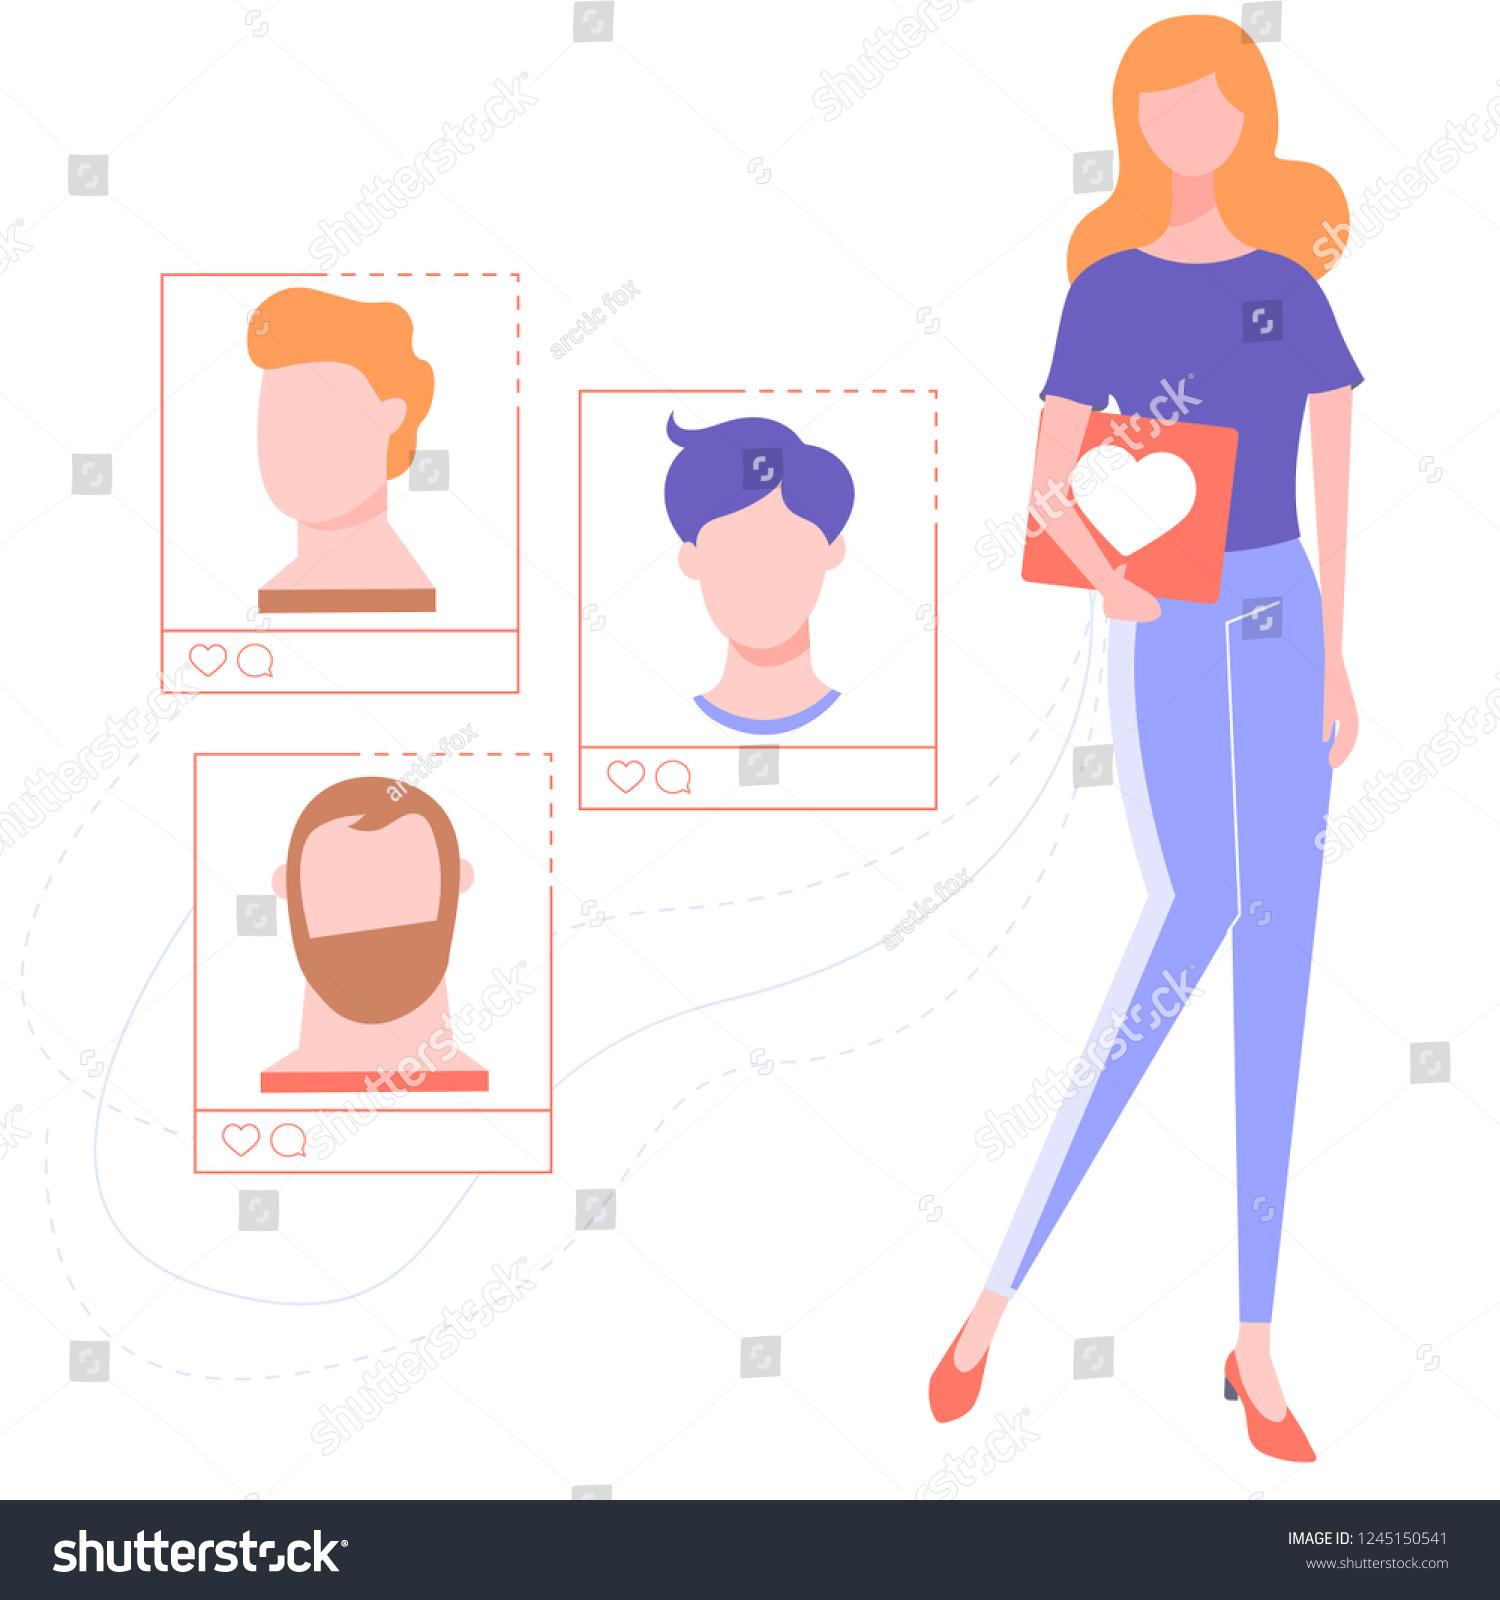 Affleck dating